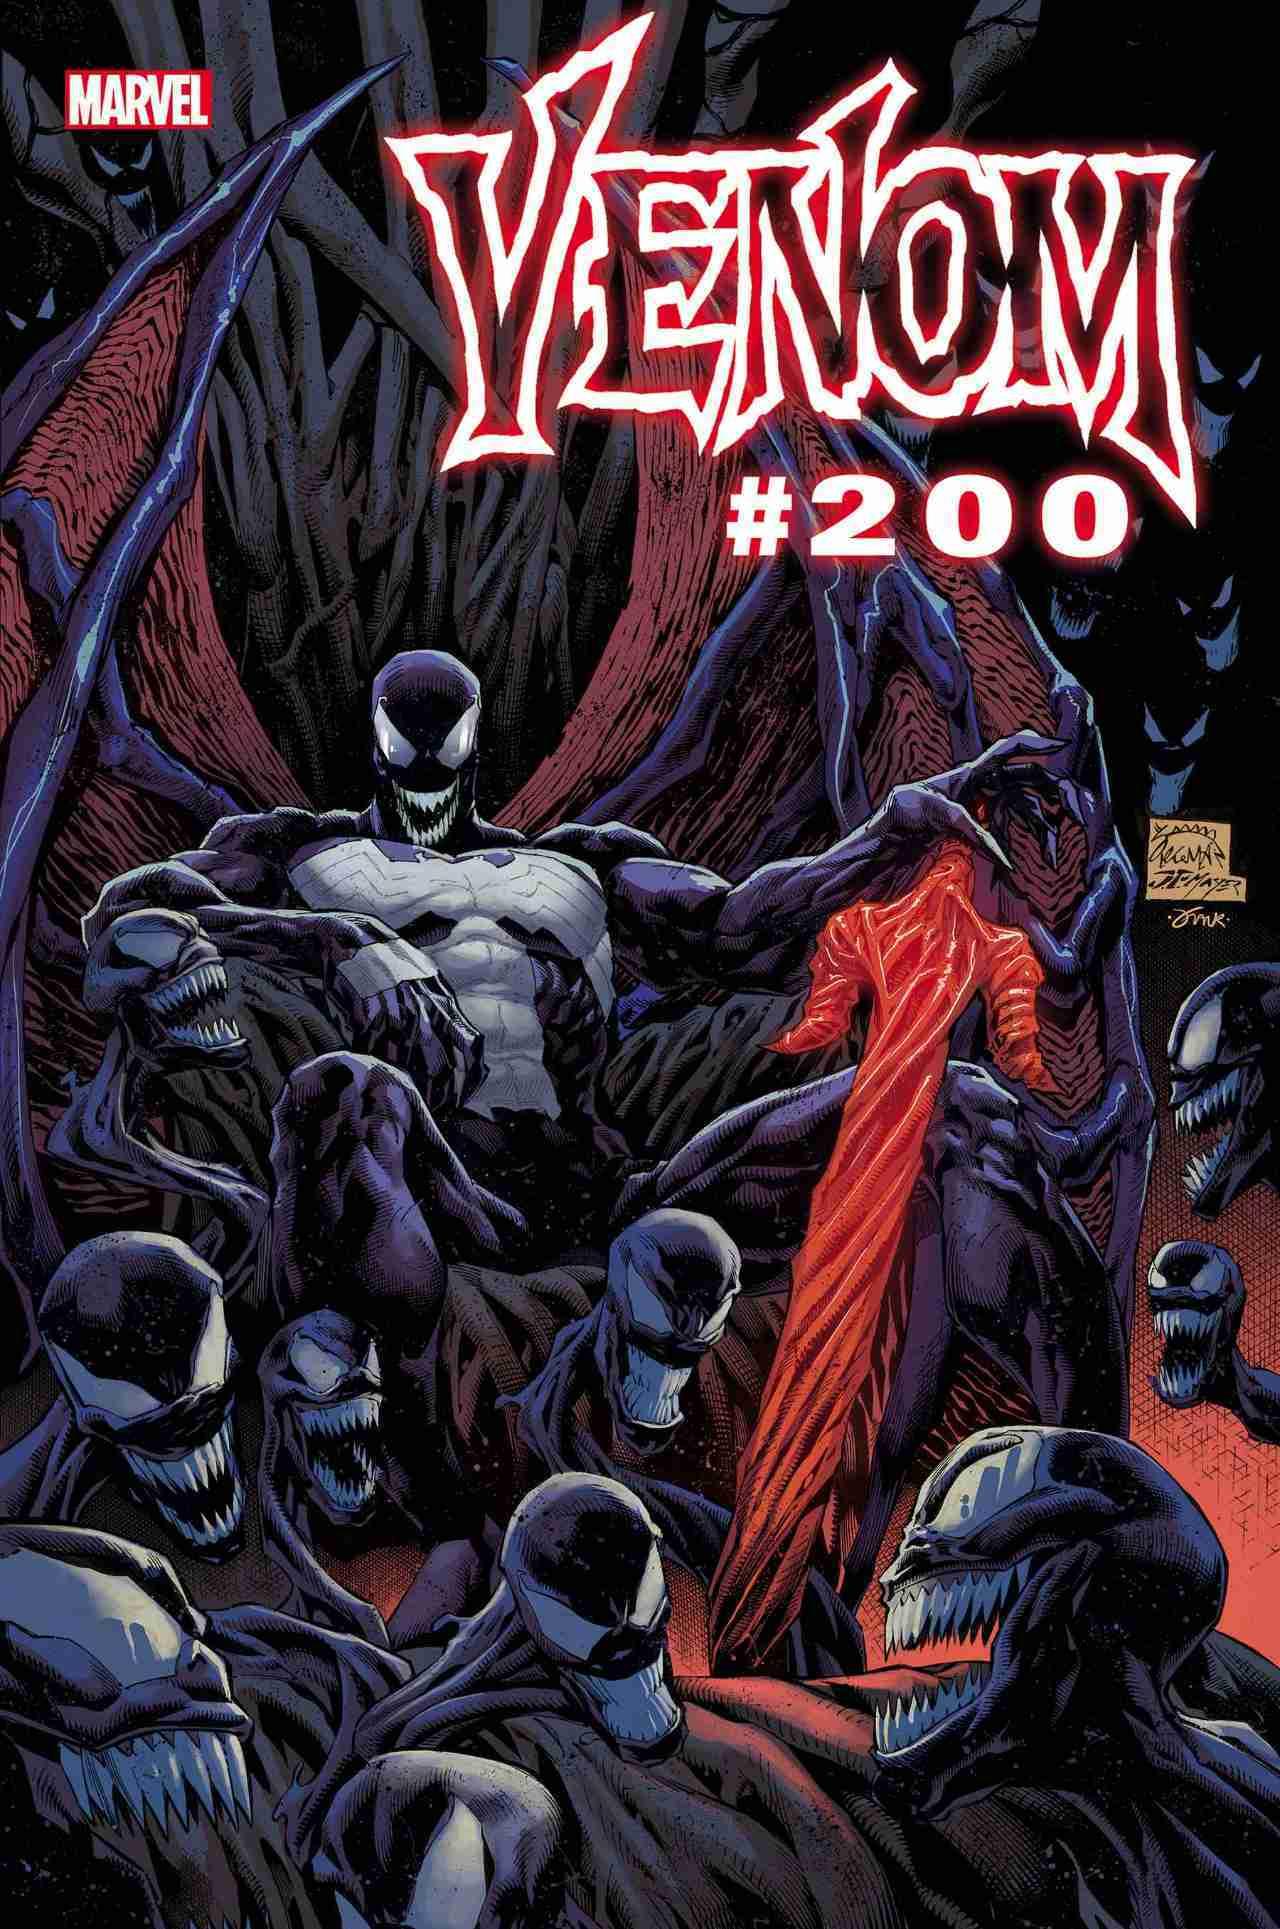 Venom #200 Cover